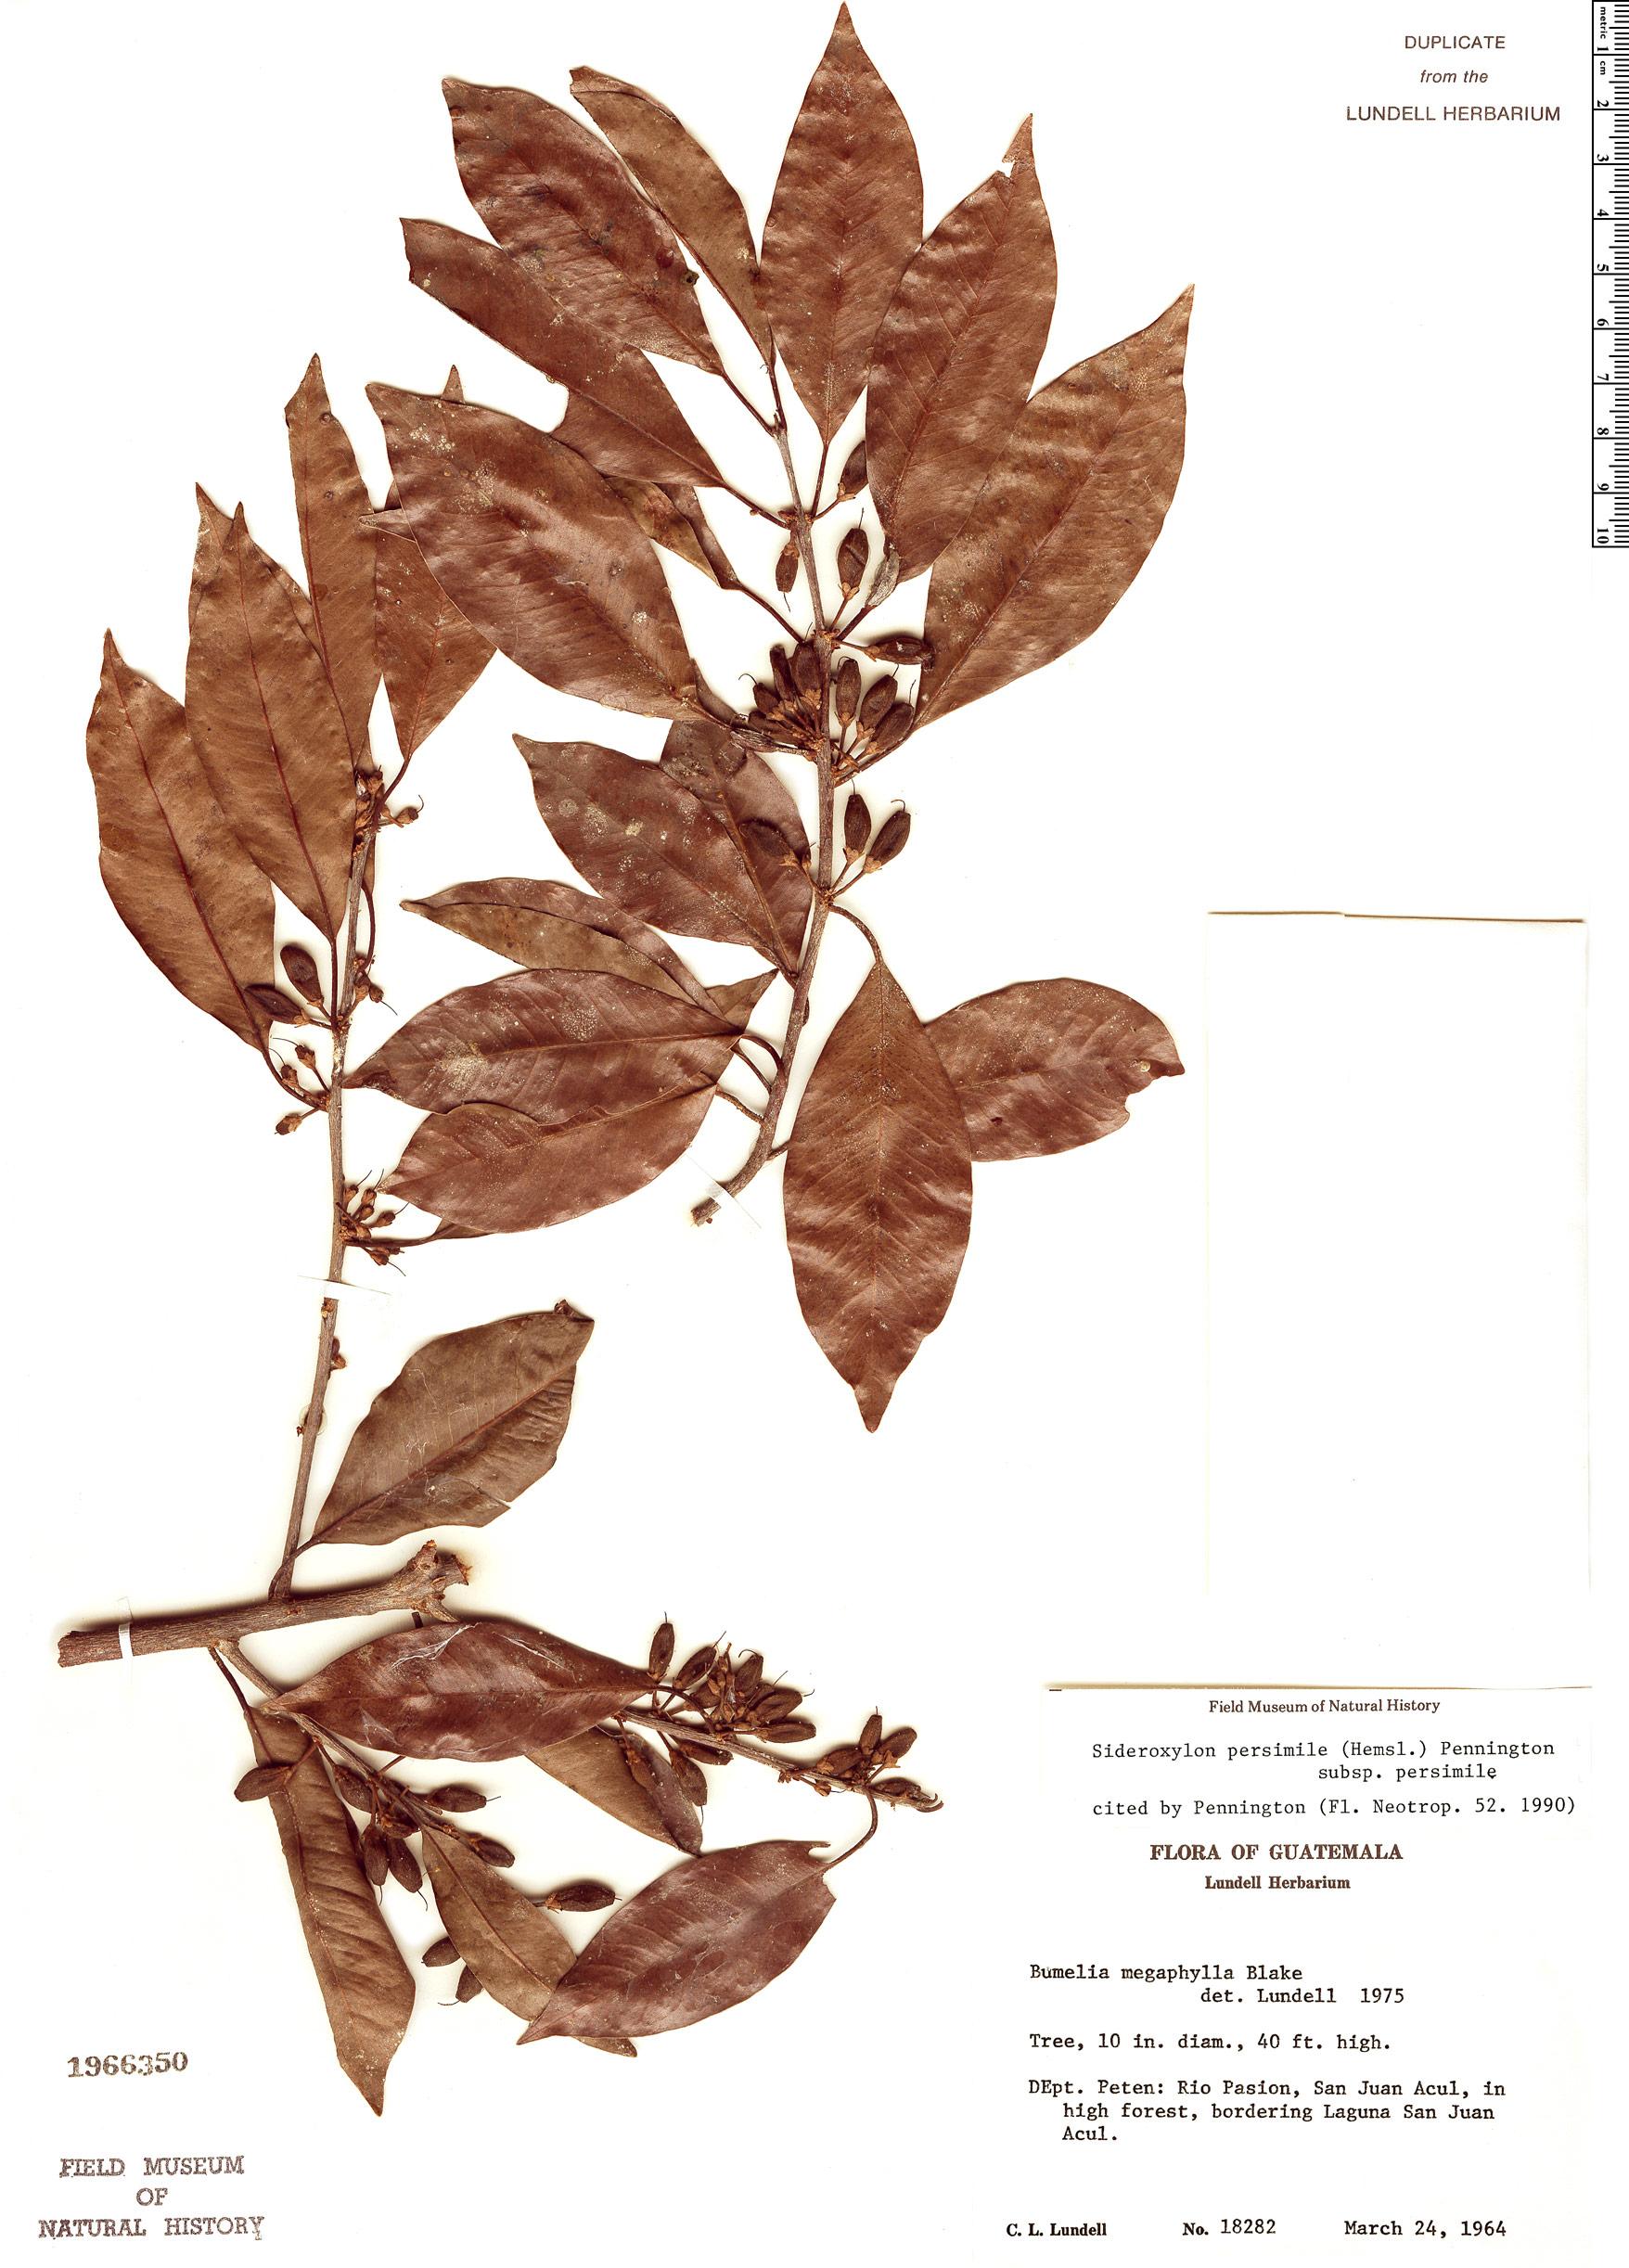 Specimen: Sideroxylon persimile